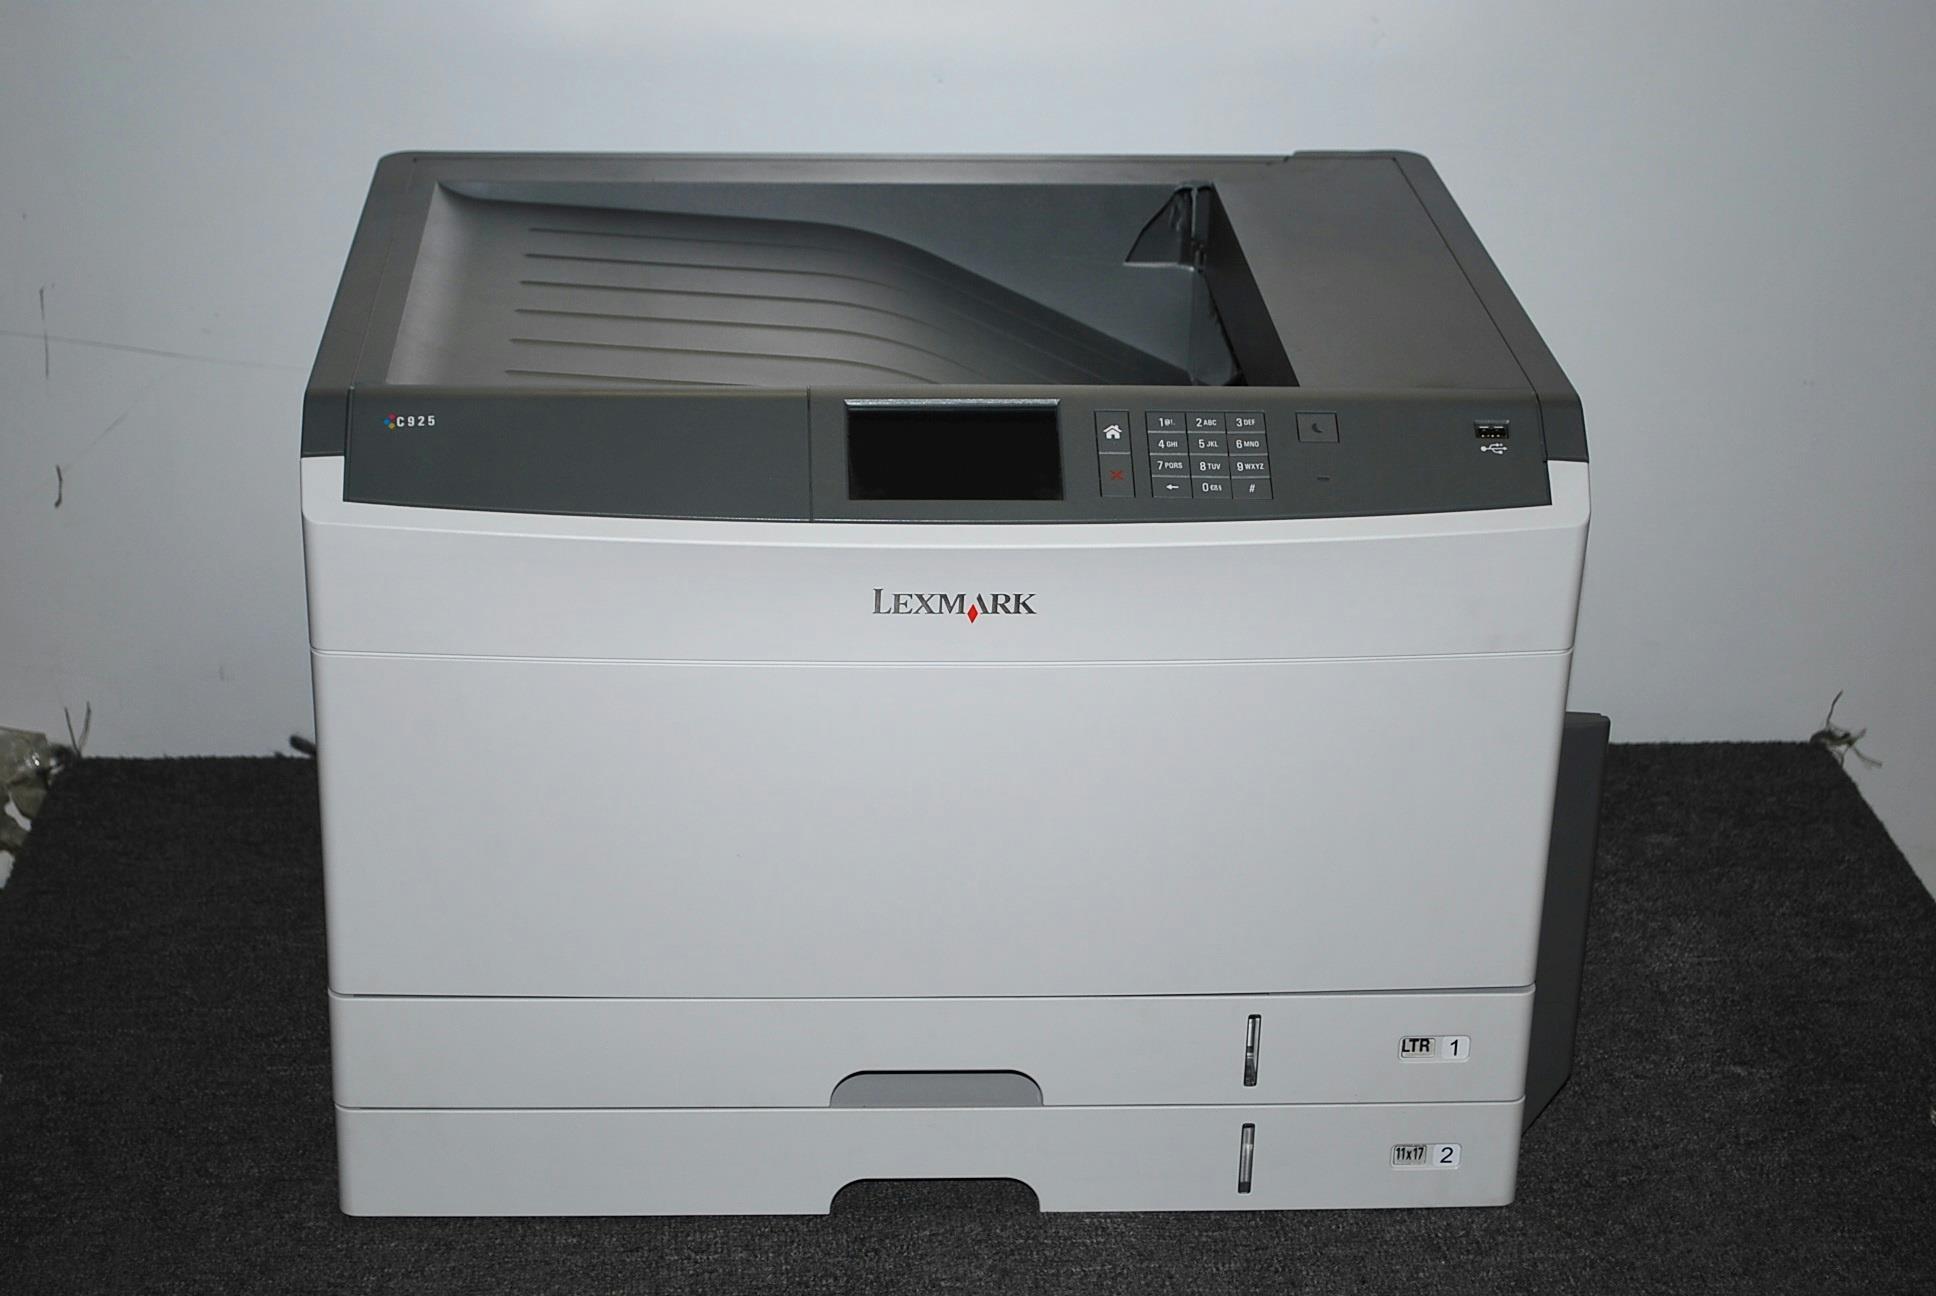 Lexmark X925 Printer Universal PCL5e Drivers for Windows